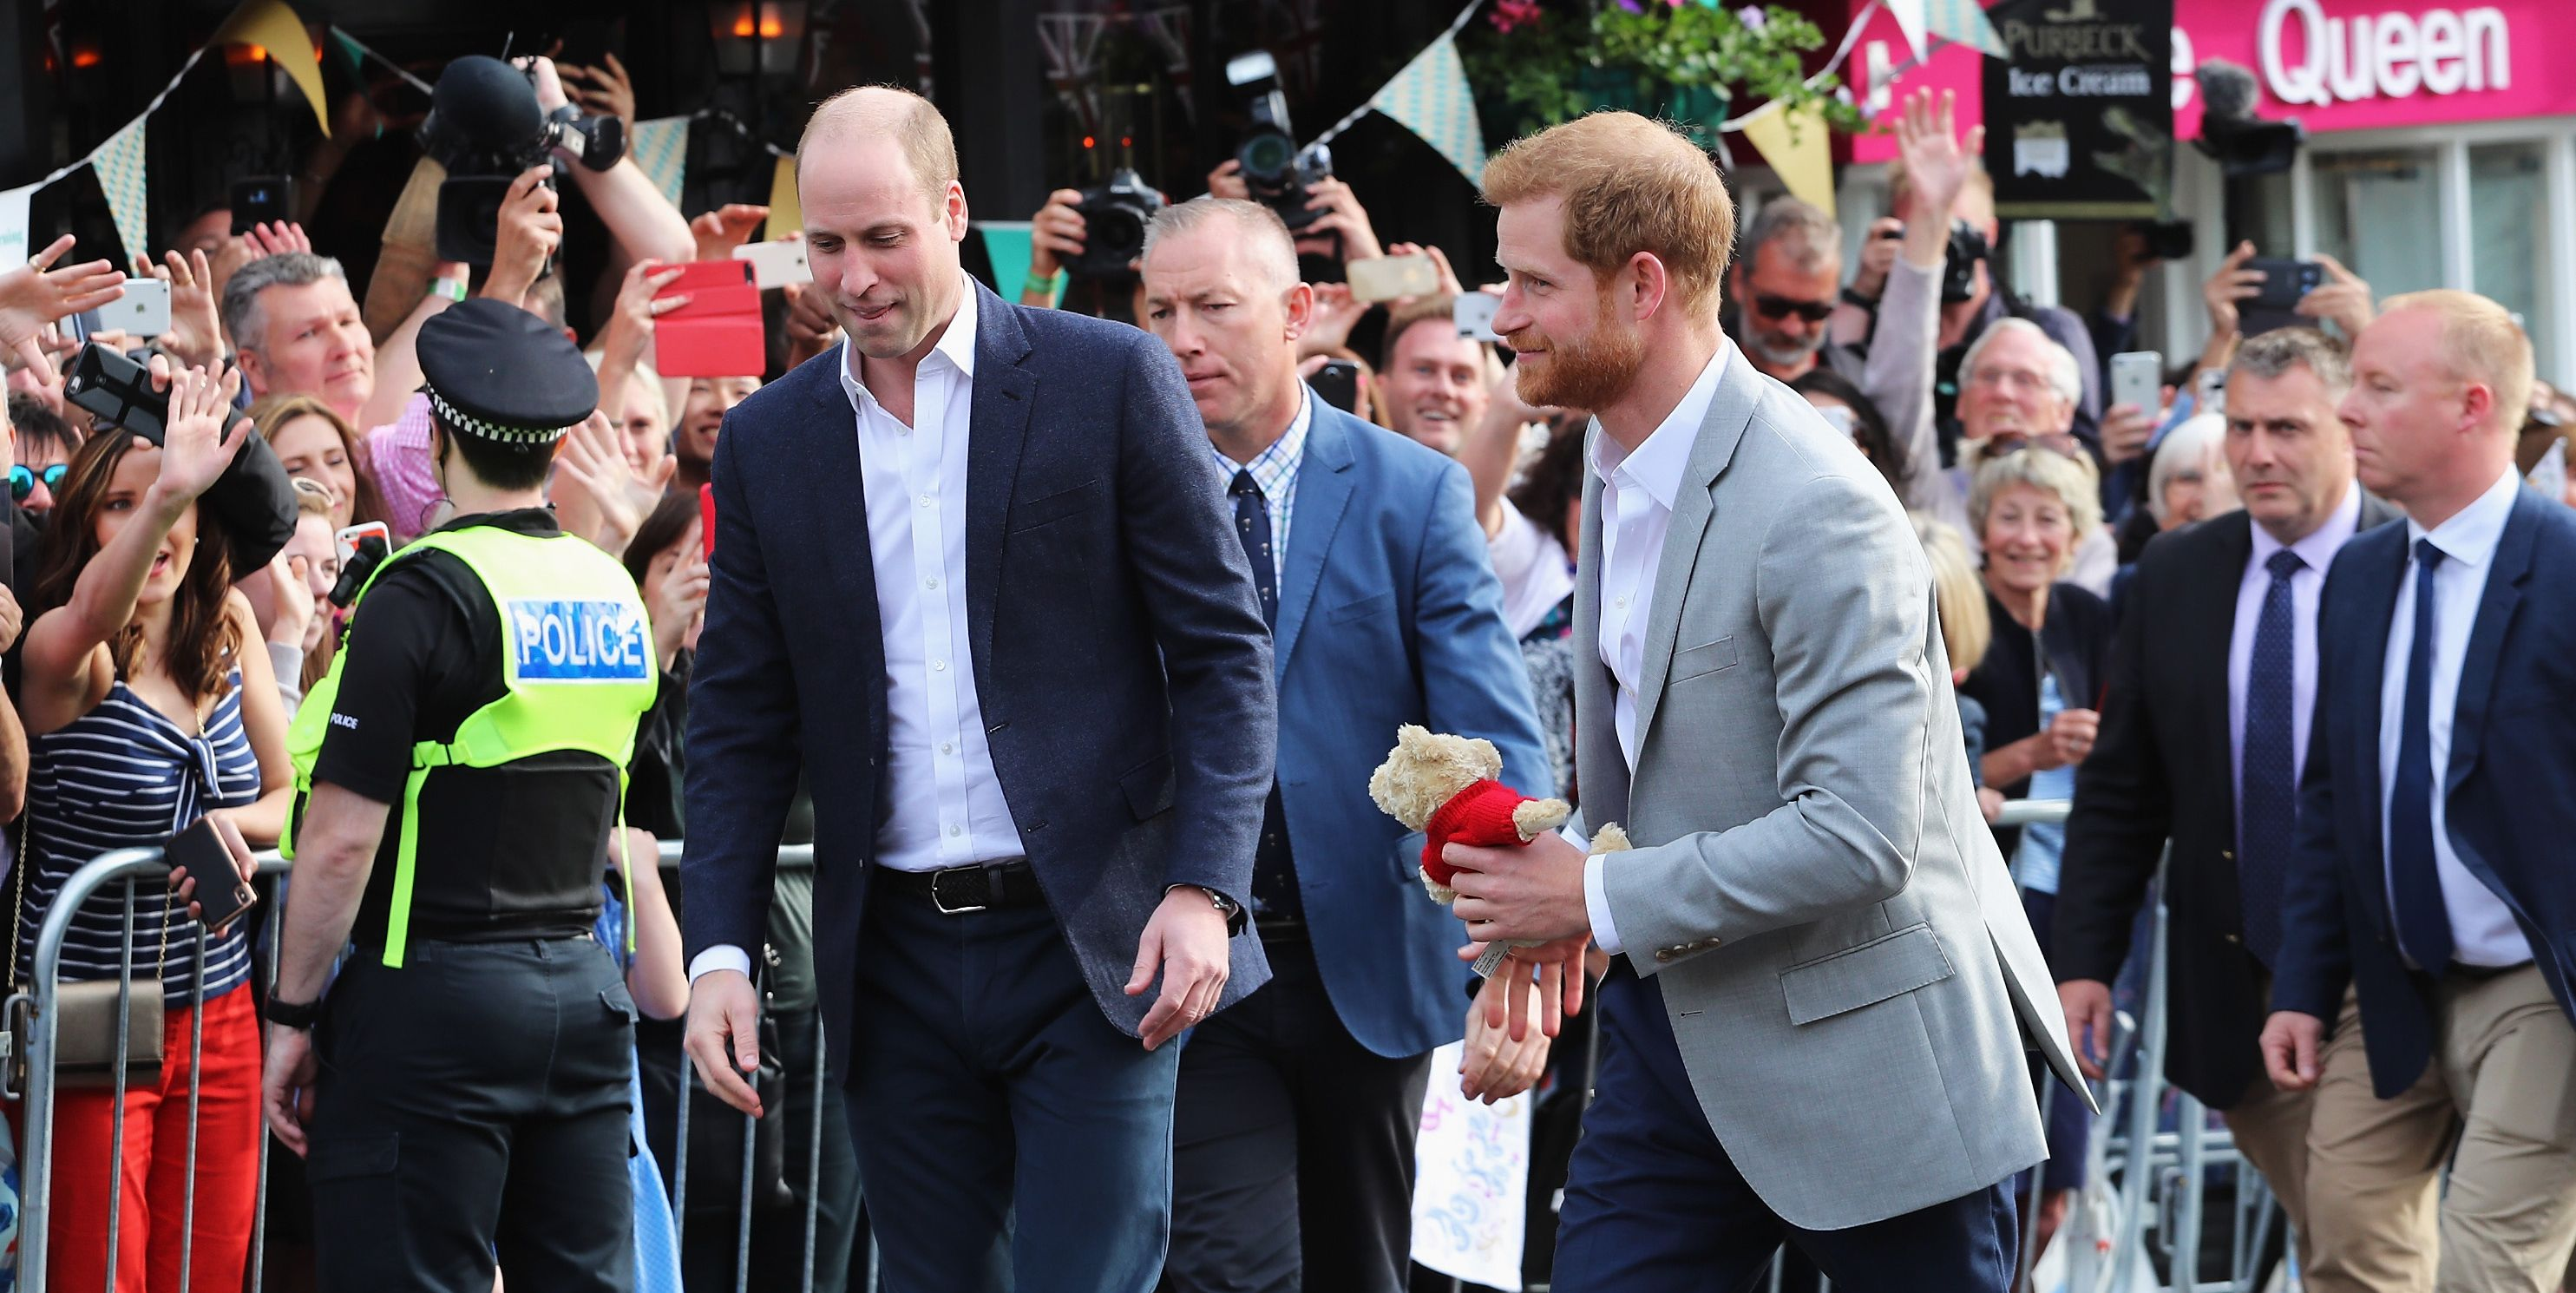 Britishprinces on walkabout of Windsor before royal wedding